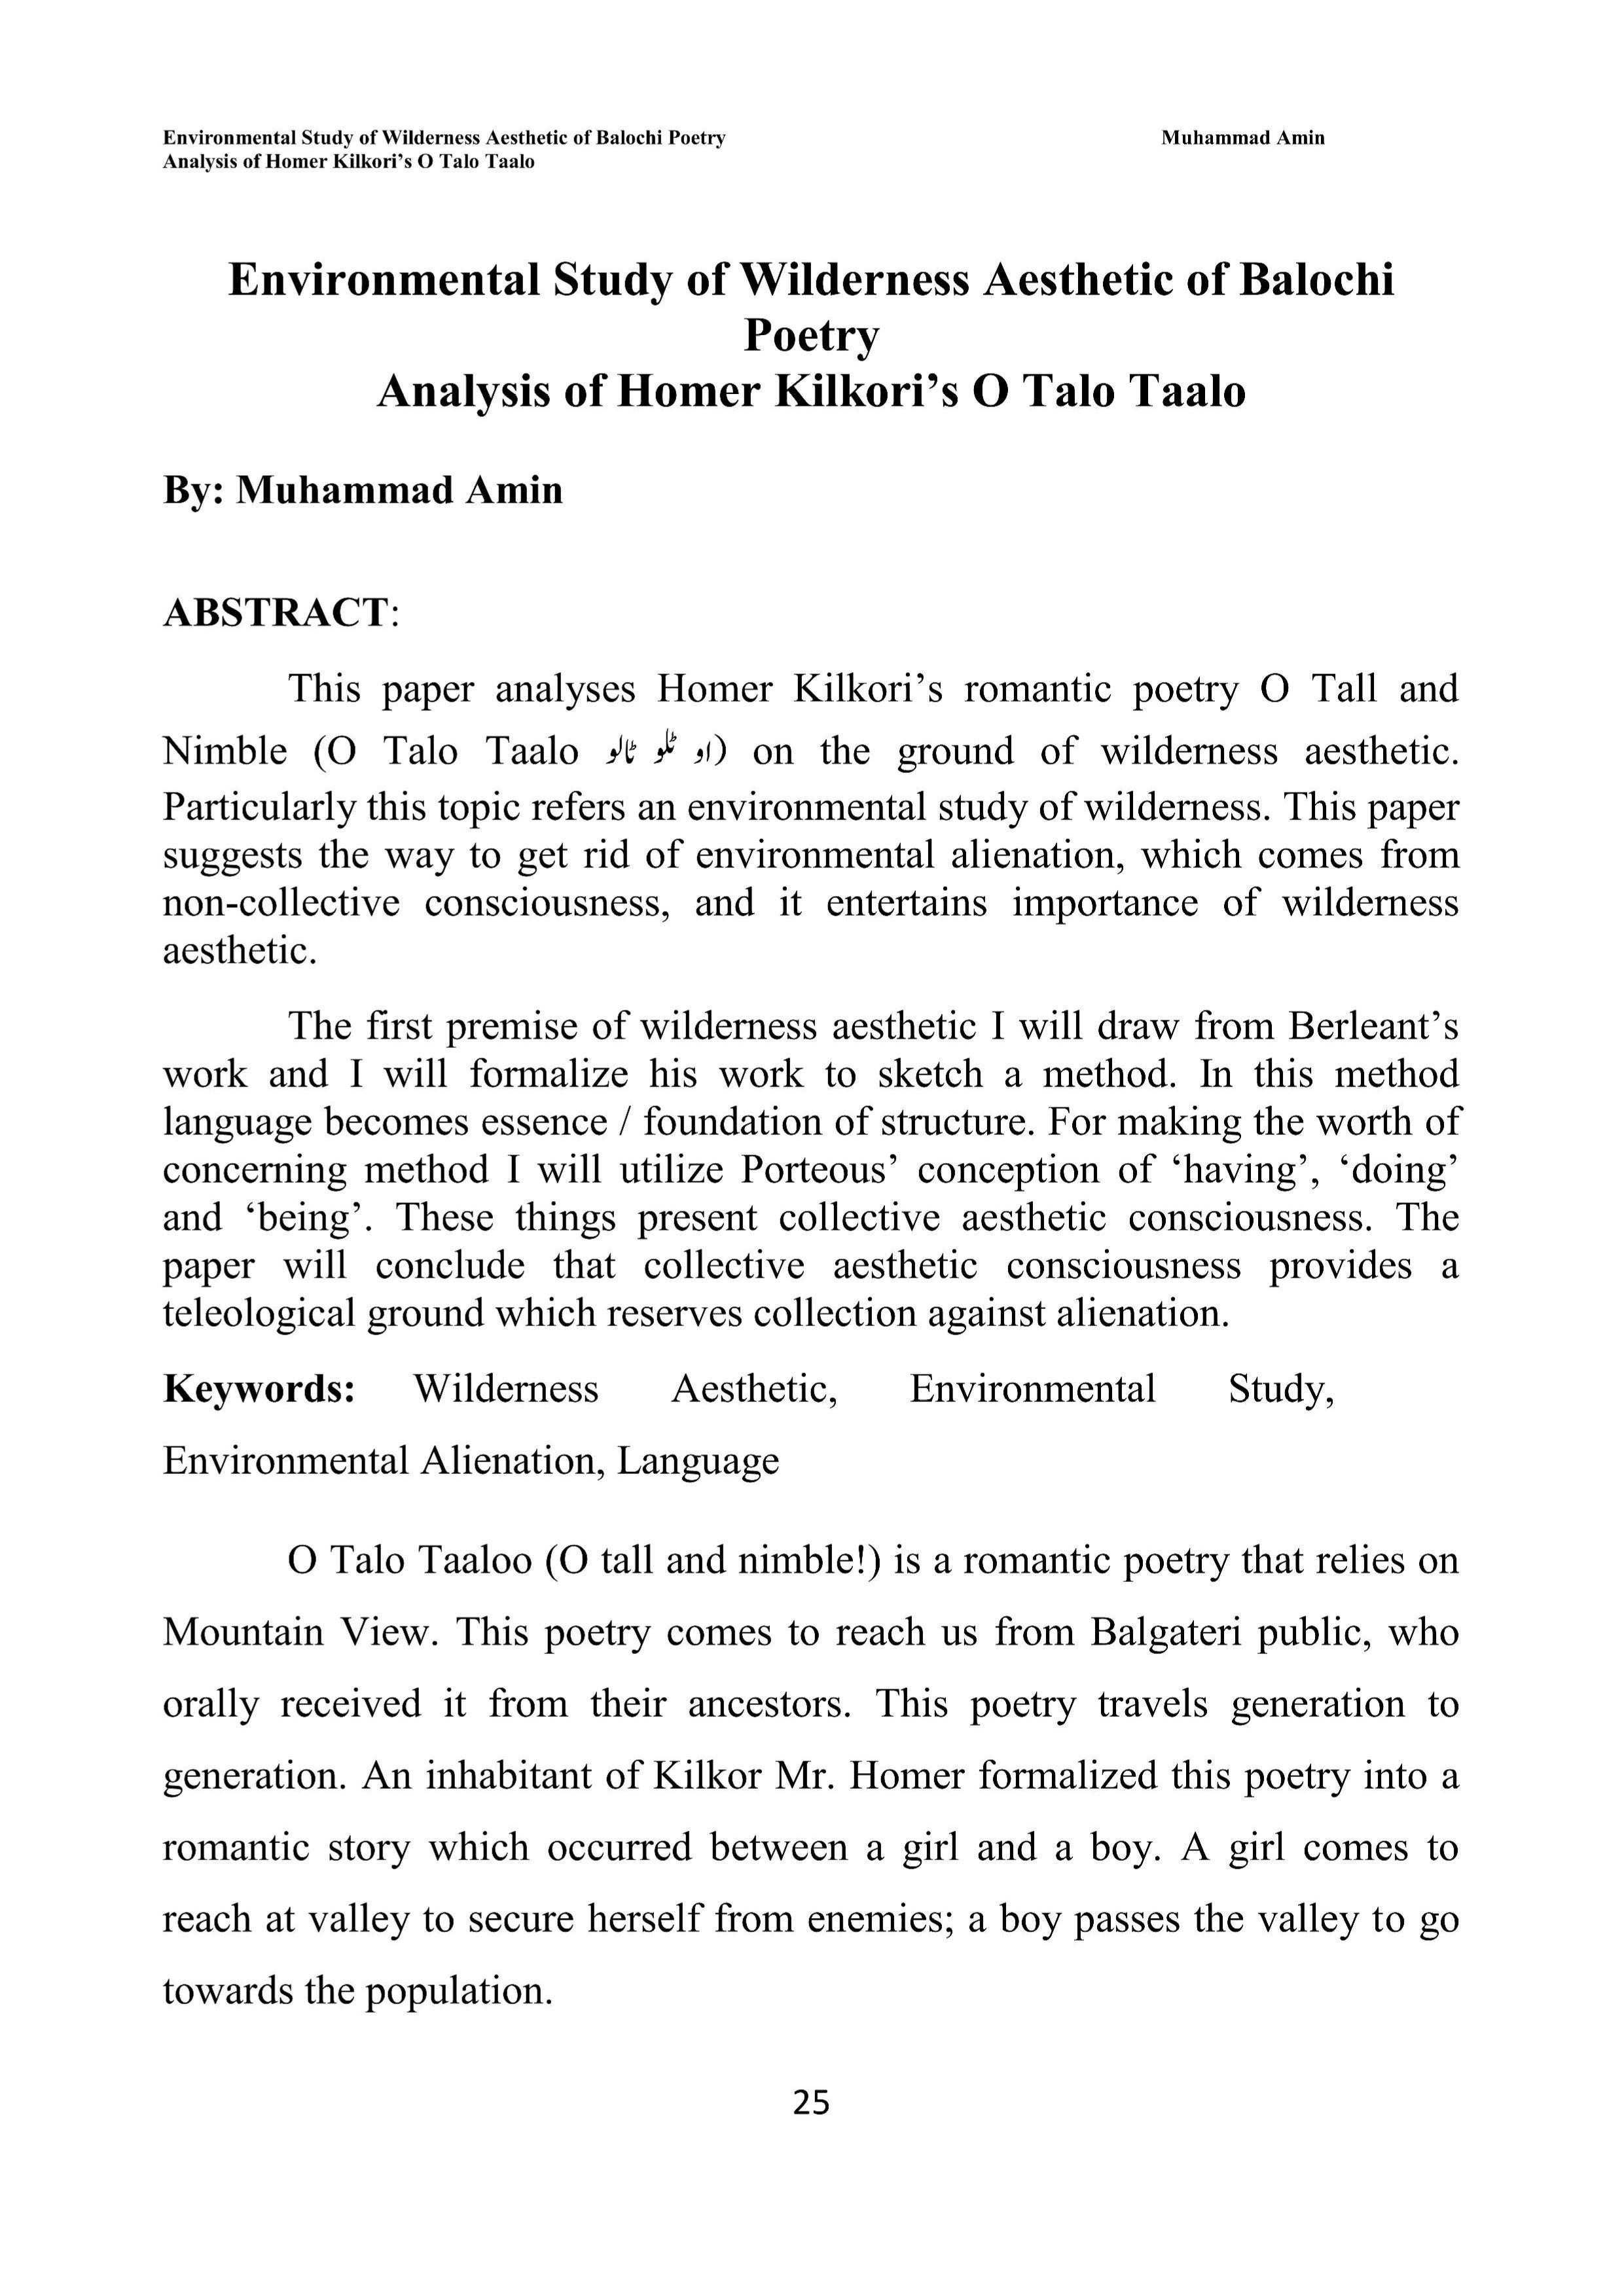 Environmental Study of Wilderness Aesthetic of Balochi Poetry Analysis of Homer Kilkori's O Talo Taalo